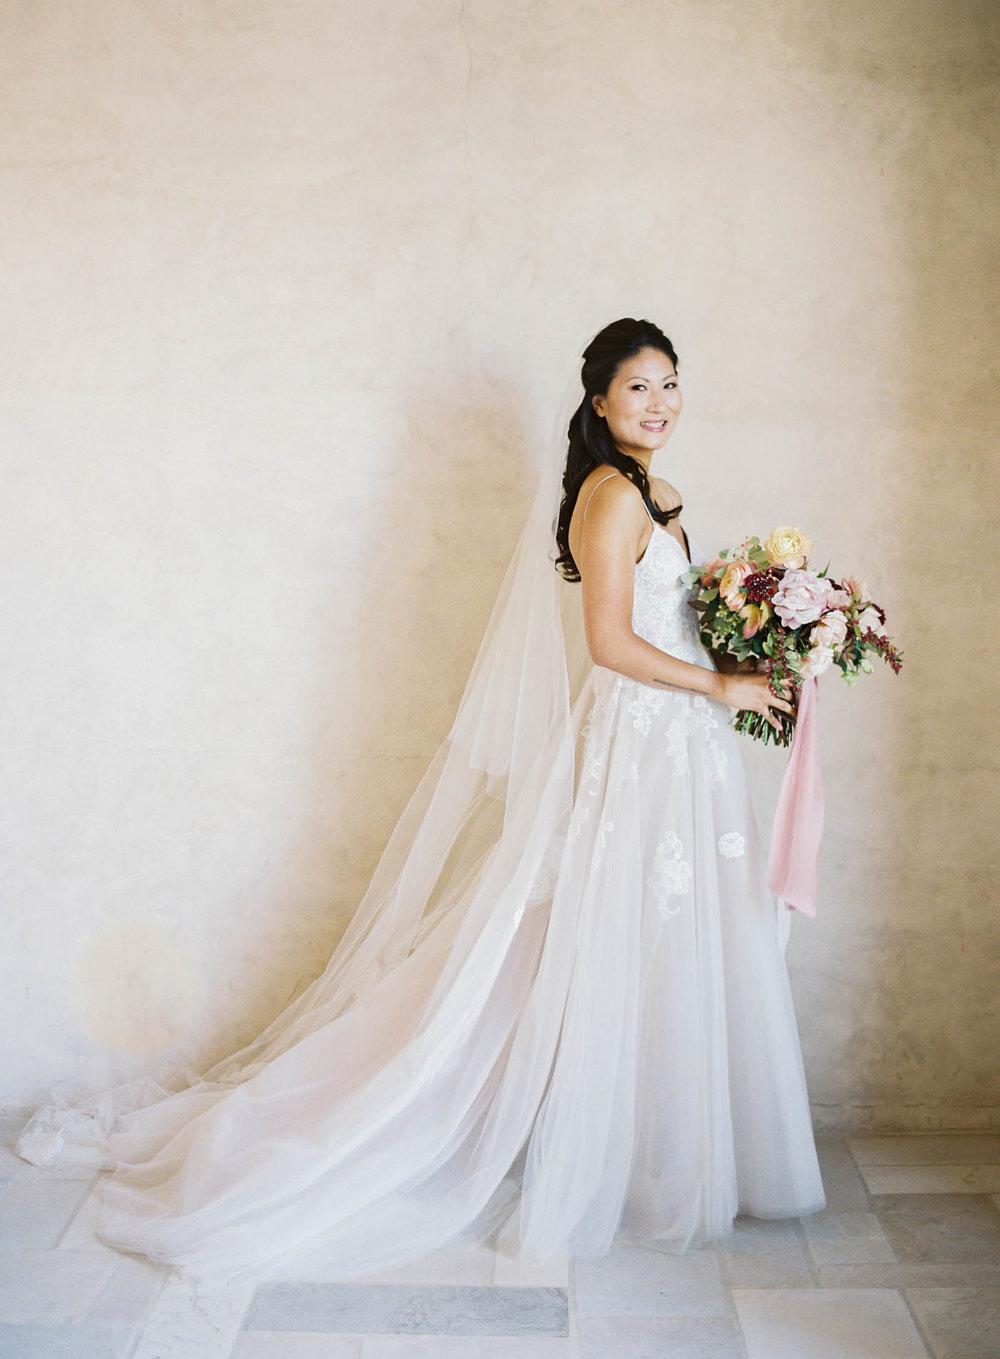 sunstone-villa-wedding-7-Jen_Huang-RD-33-Jen_Huang-009578-R1-001.jpg